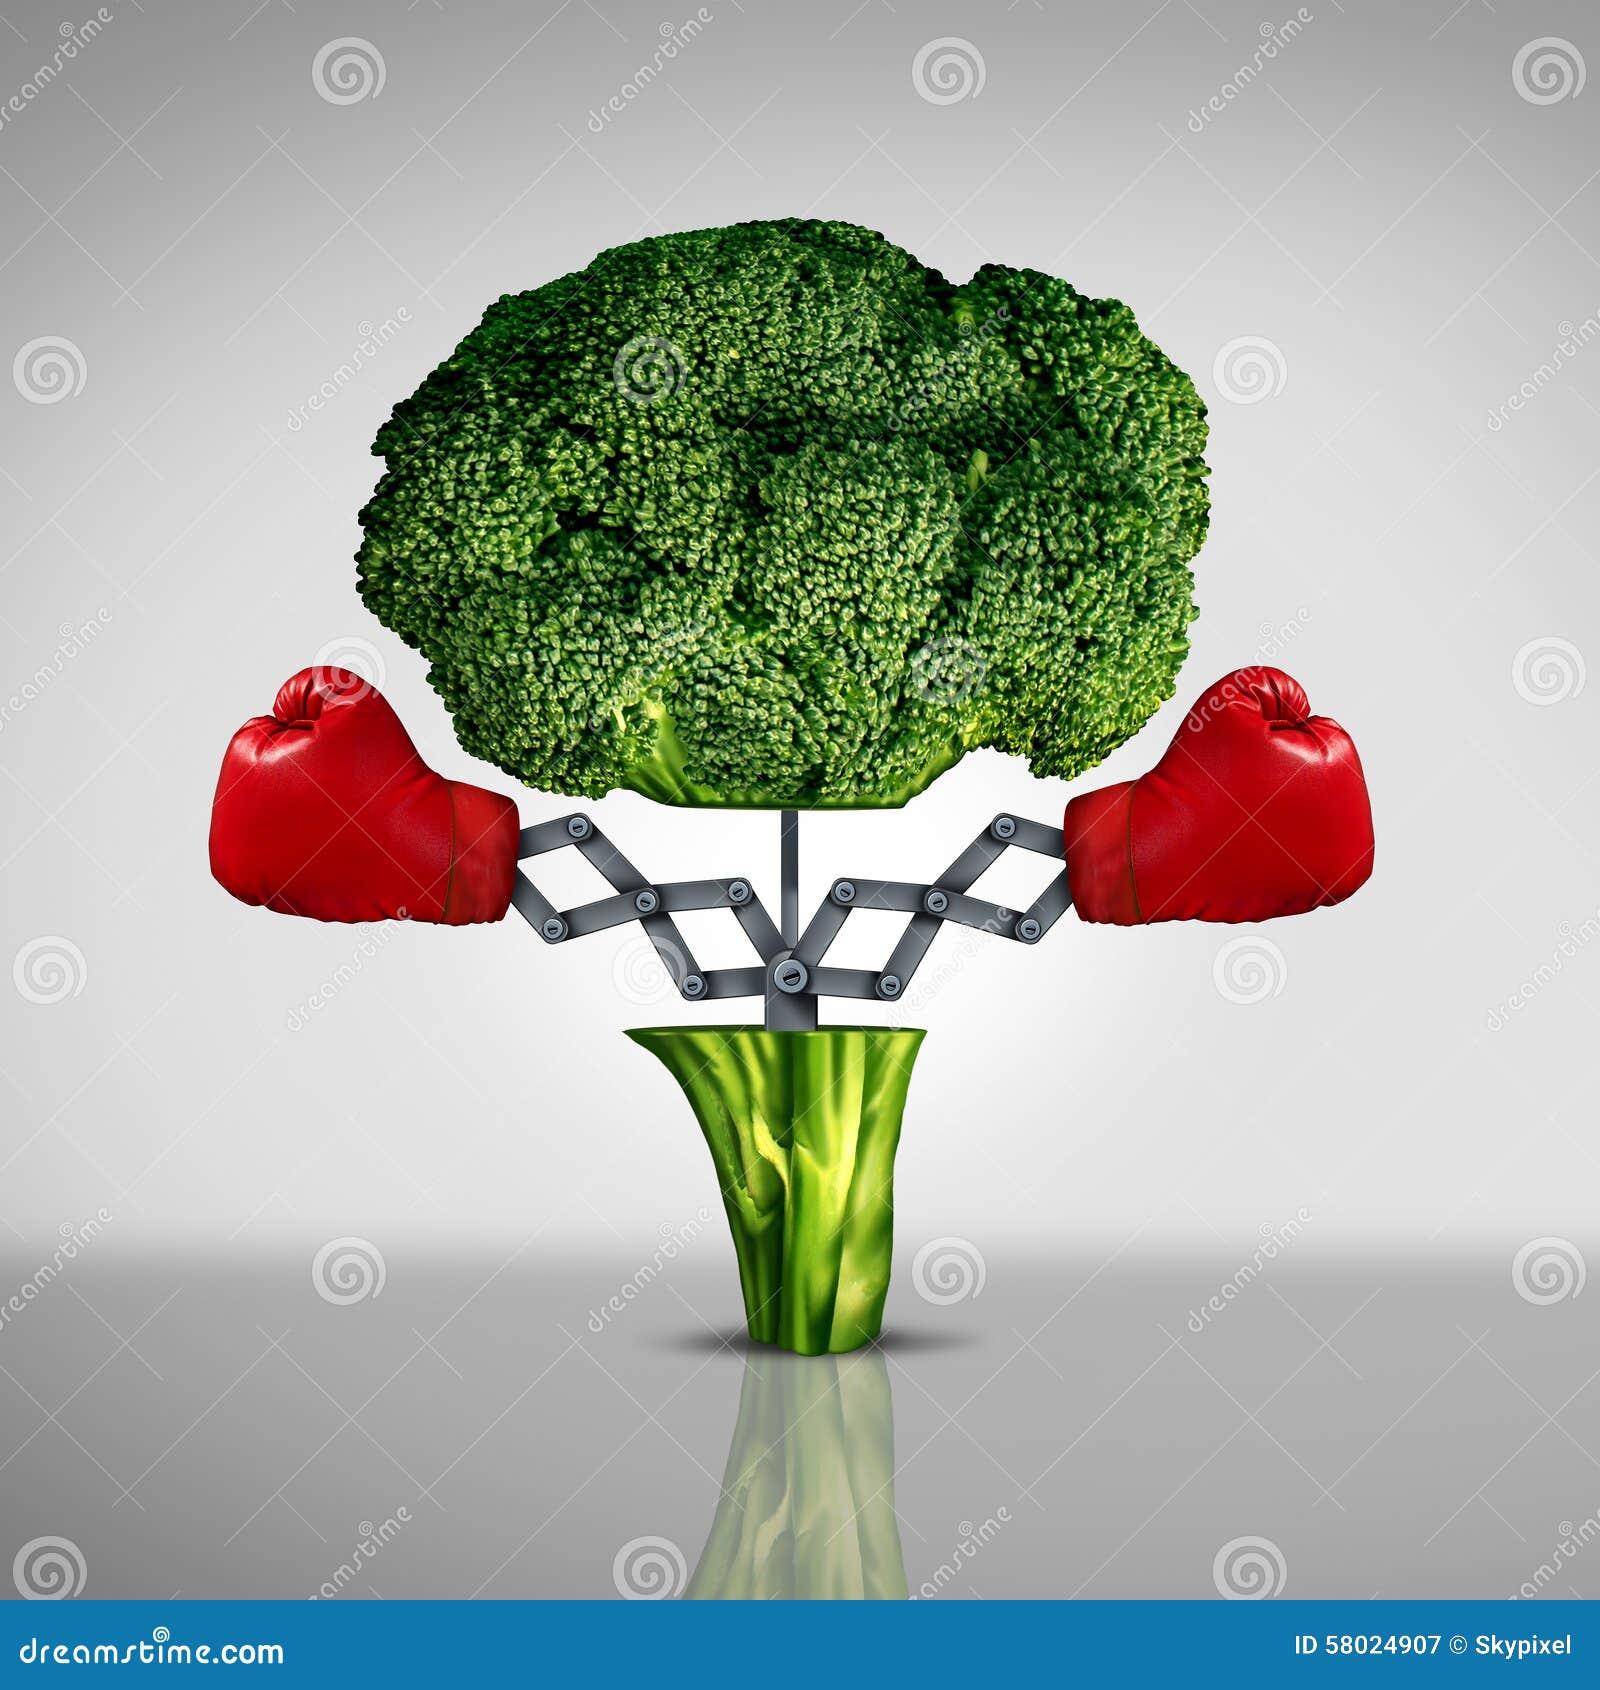 Superfood Protection Stock Illustration - Image: 58024907